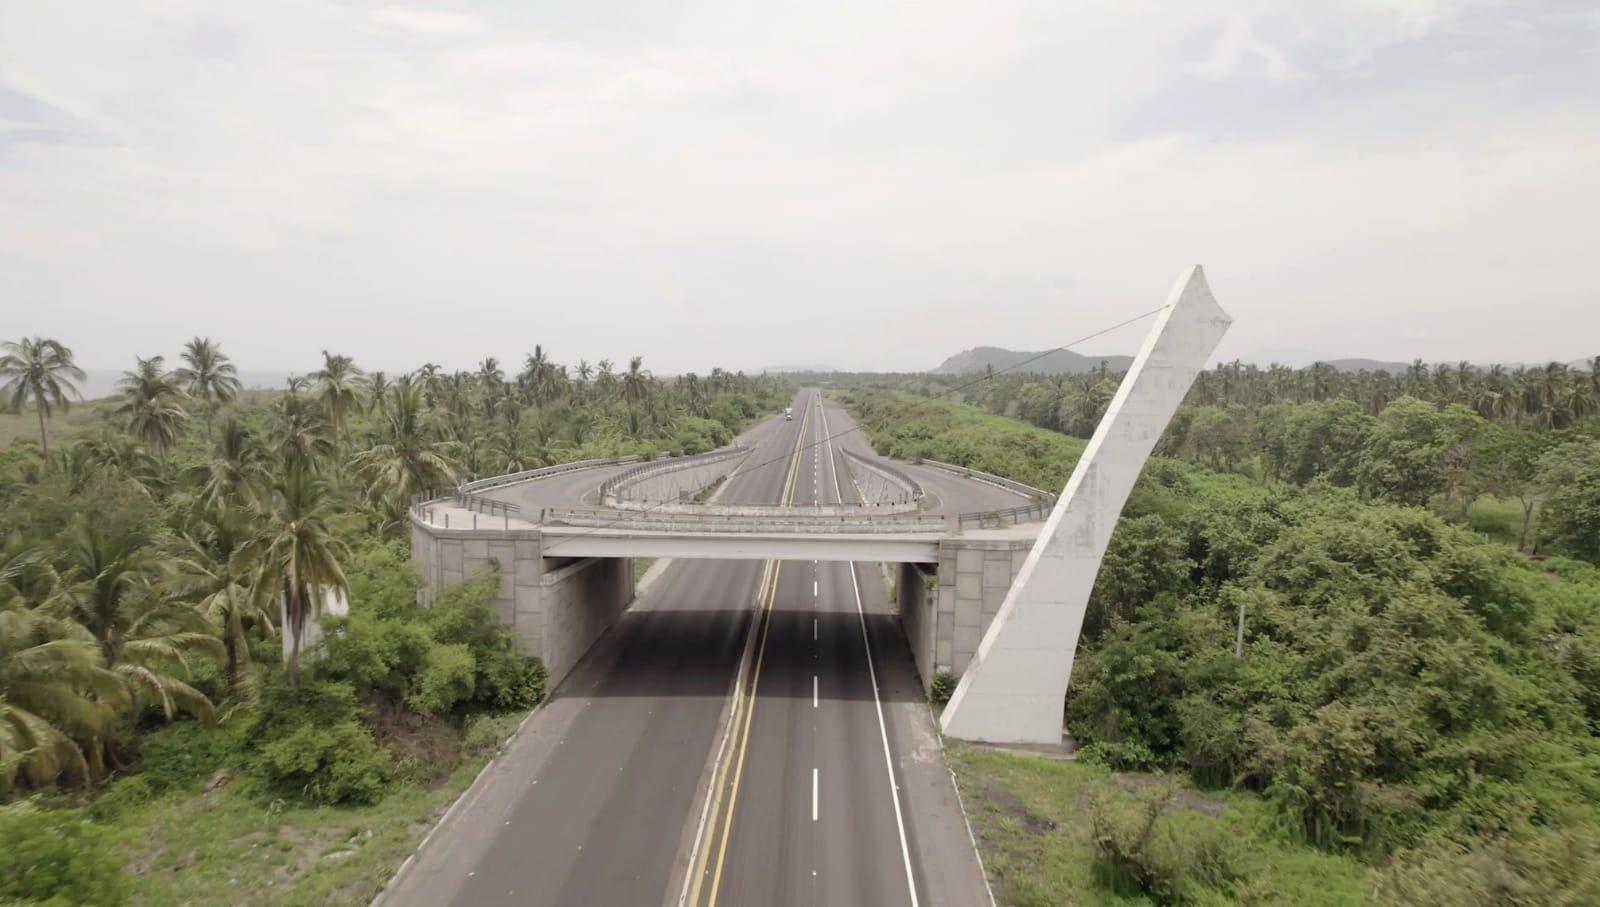 Mexico preps US$170mn Armería-Manzanillo highway modernization plans